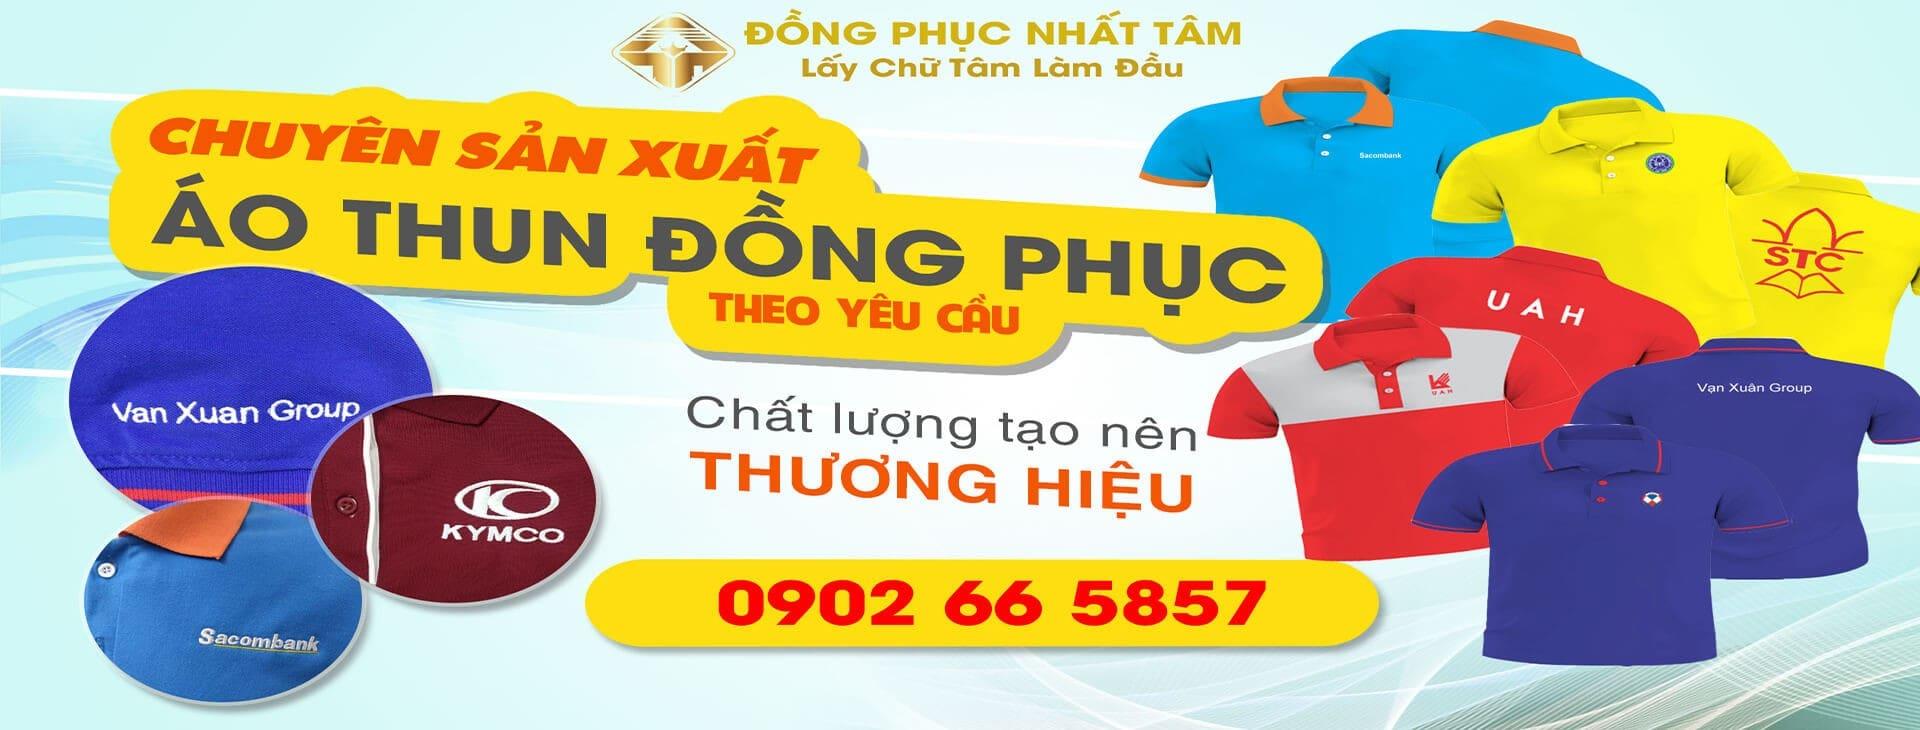 Dong Phuc Nhat Tam